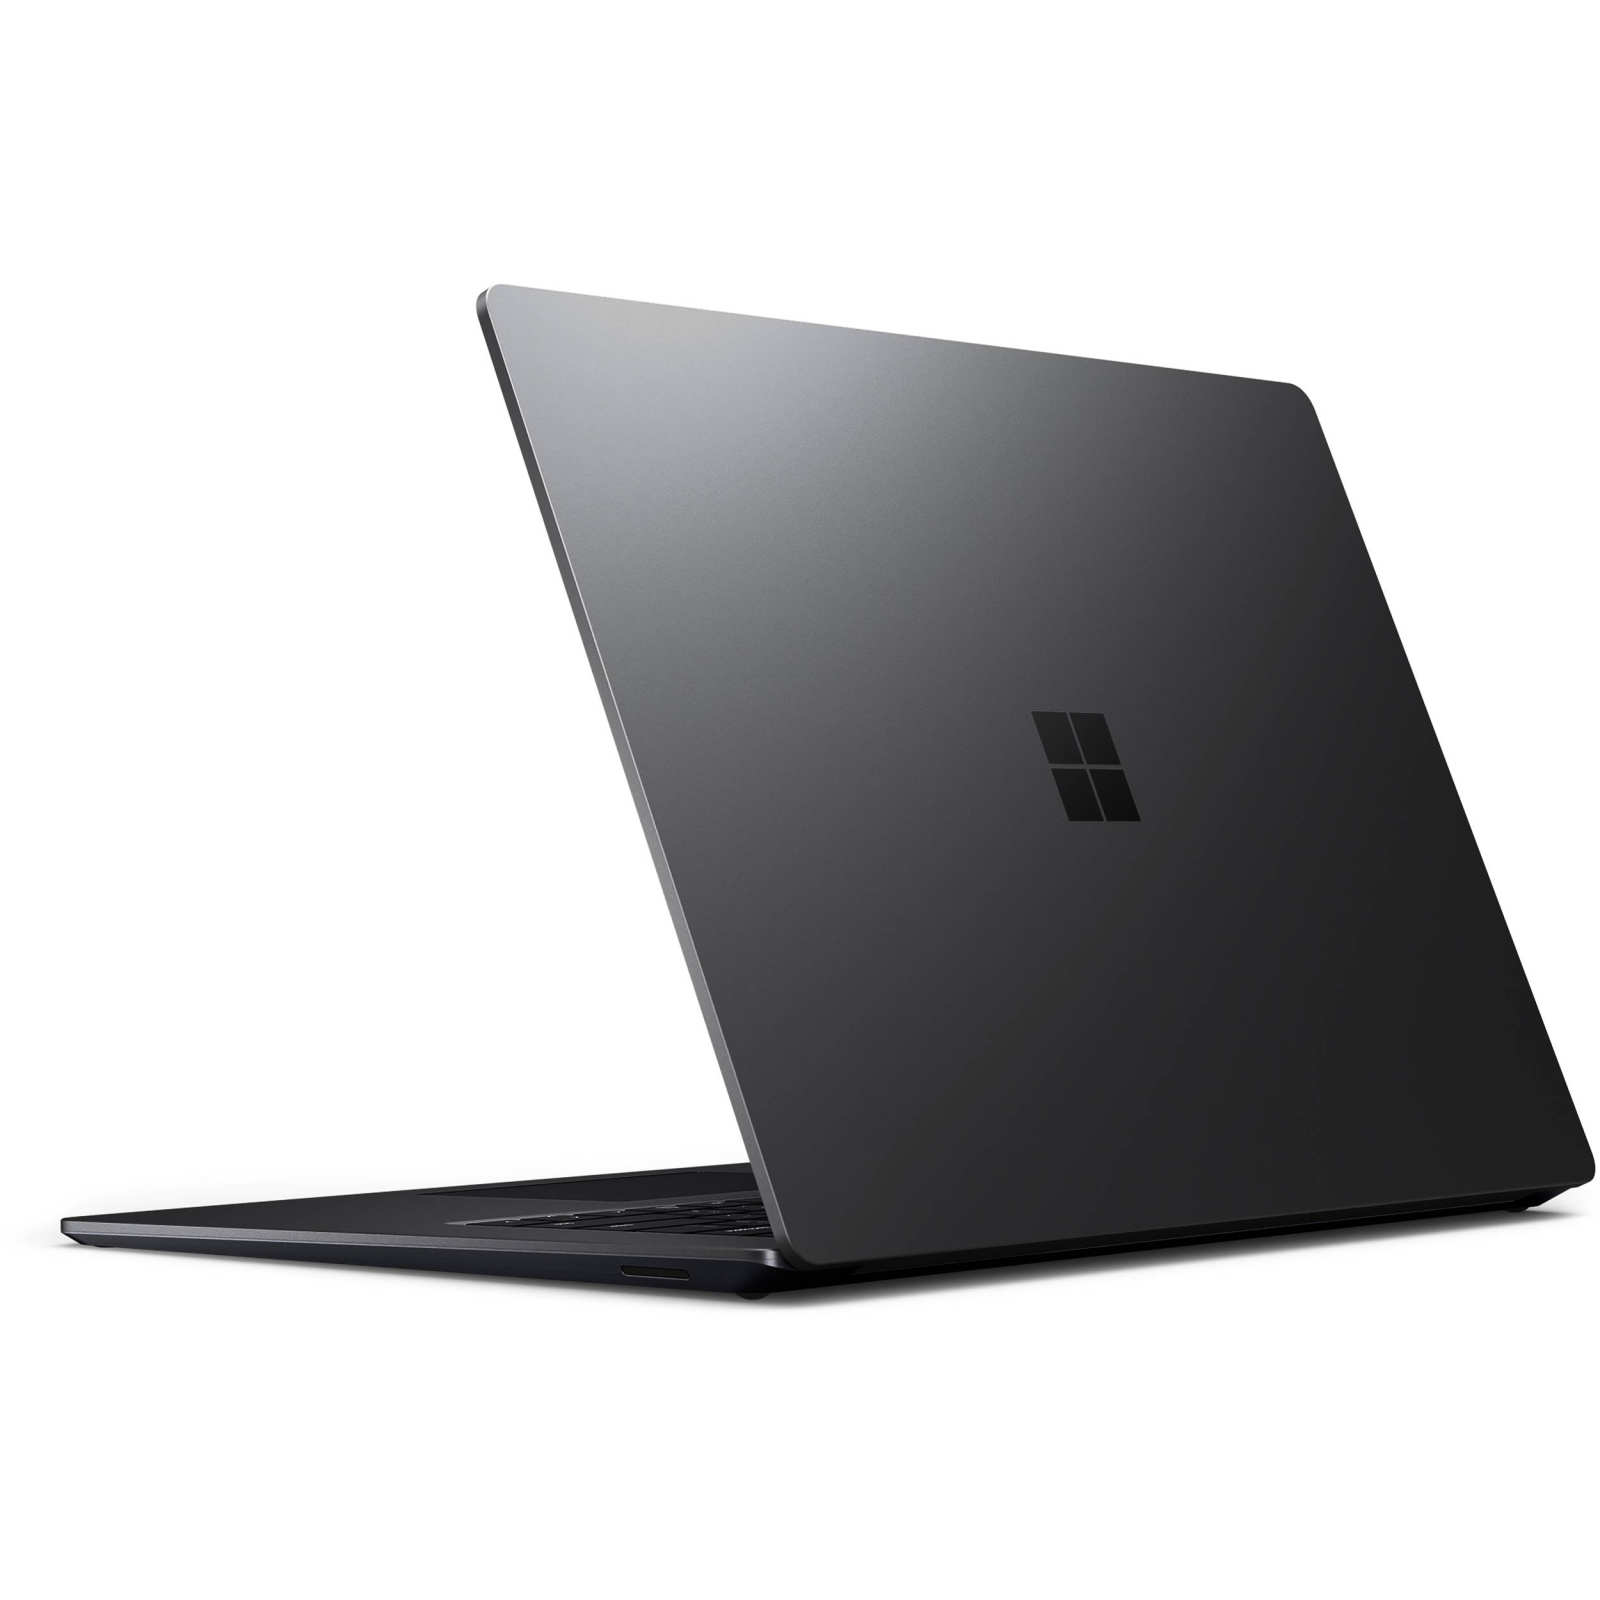 Microsoft Surface Laptop 3 - B - 256GB 15 inch Laptop